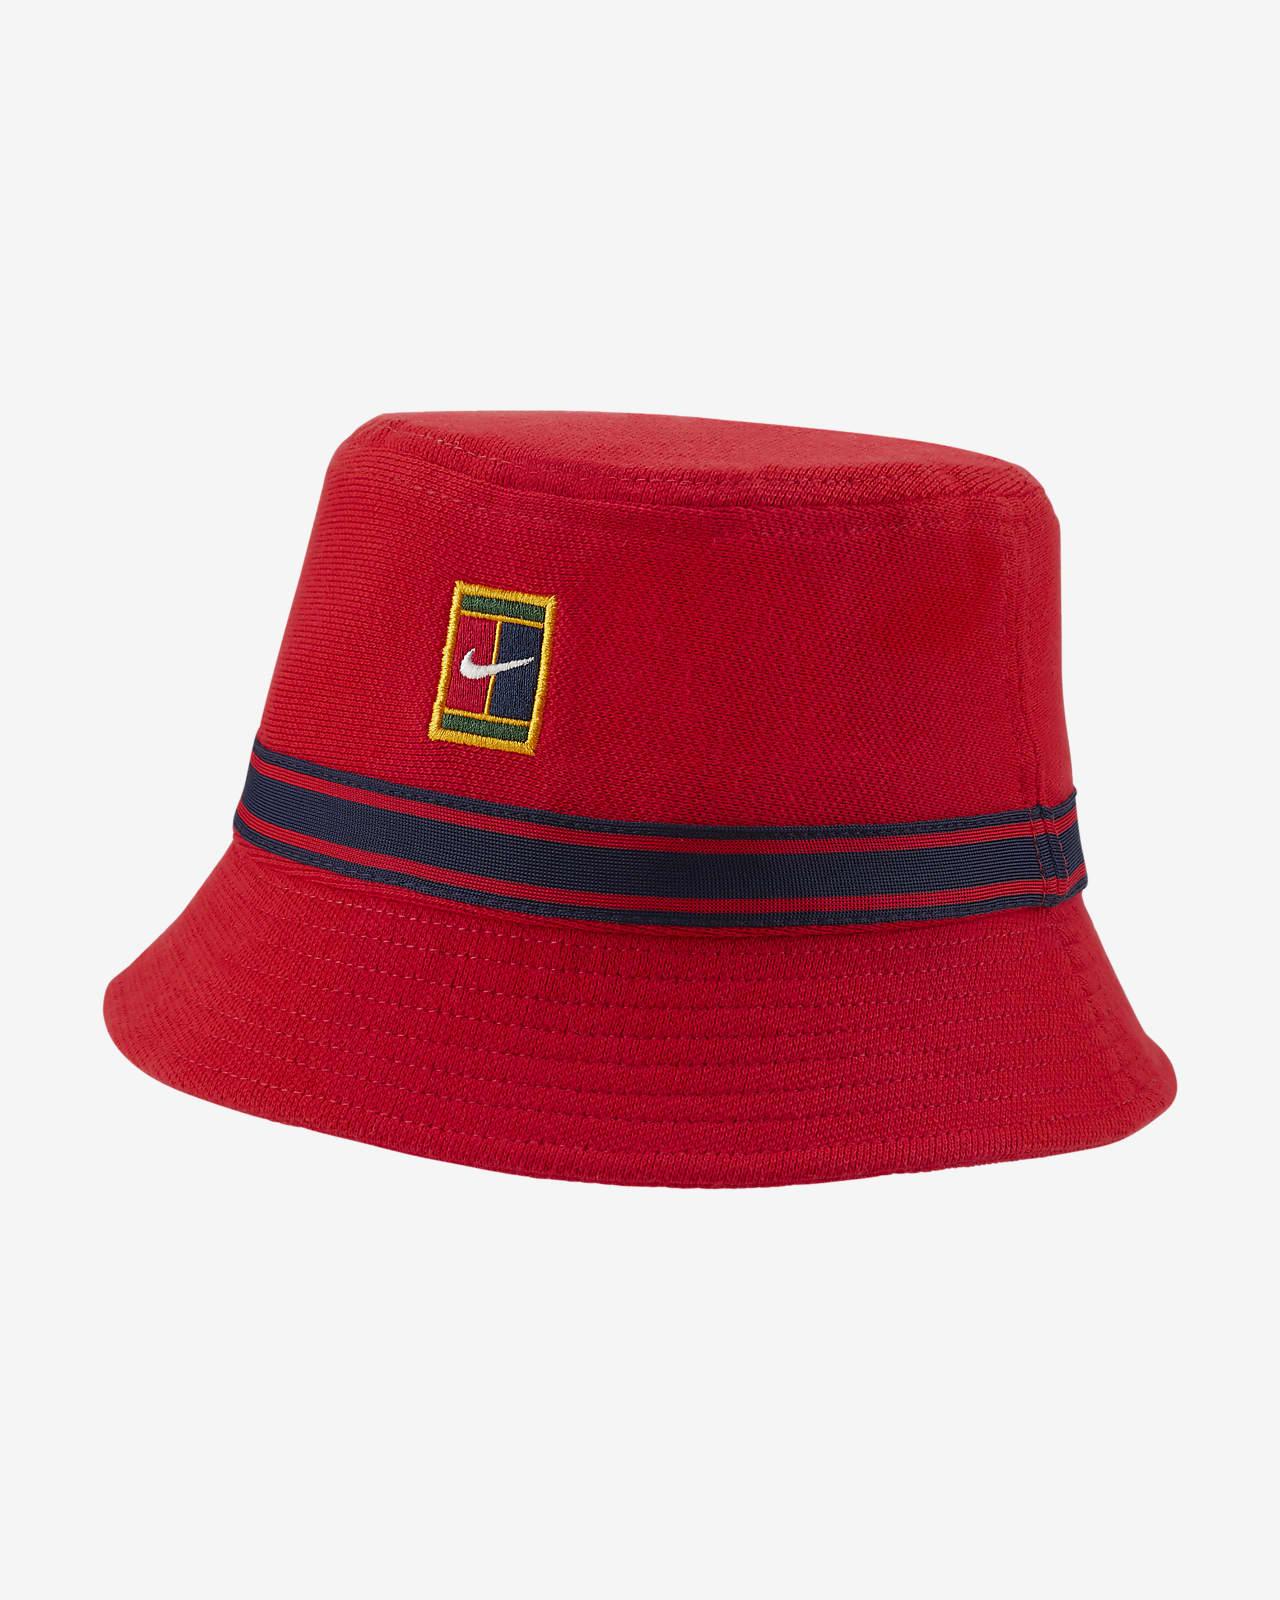 NikeCourt Tennis Bucket Hat